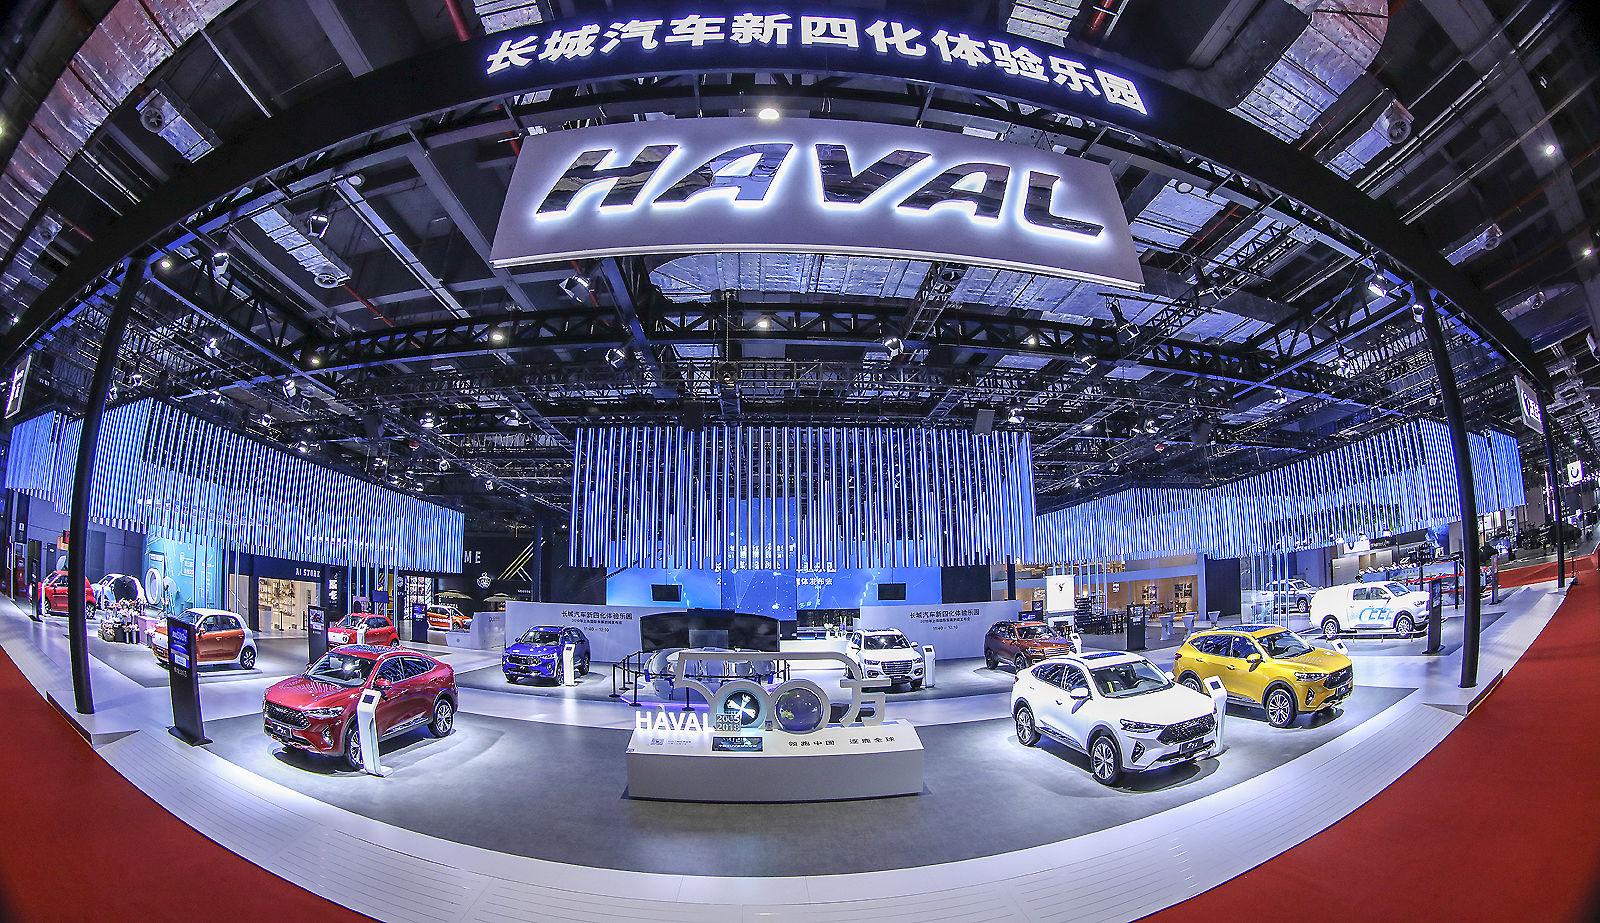 3 новинки Haval: сегодня в Шанхае, завтра — в России